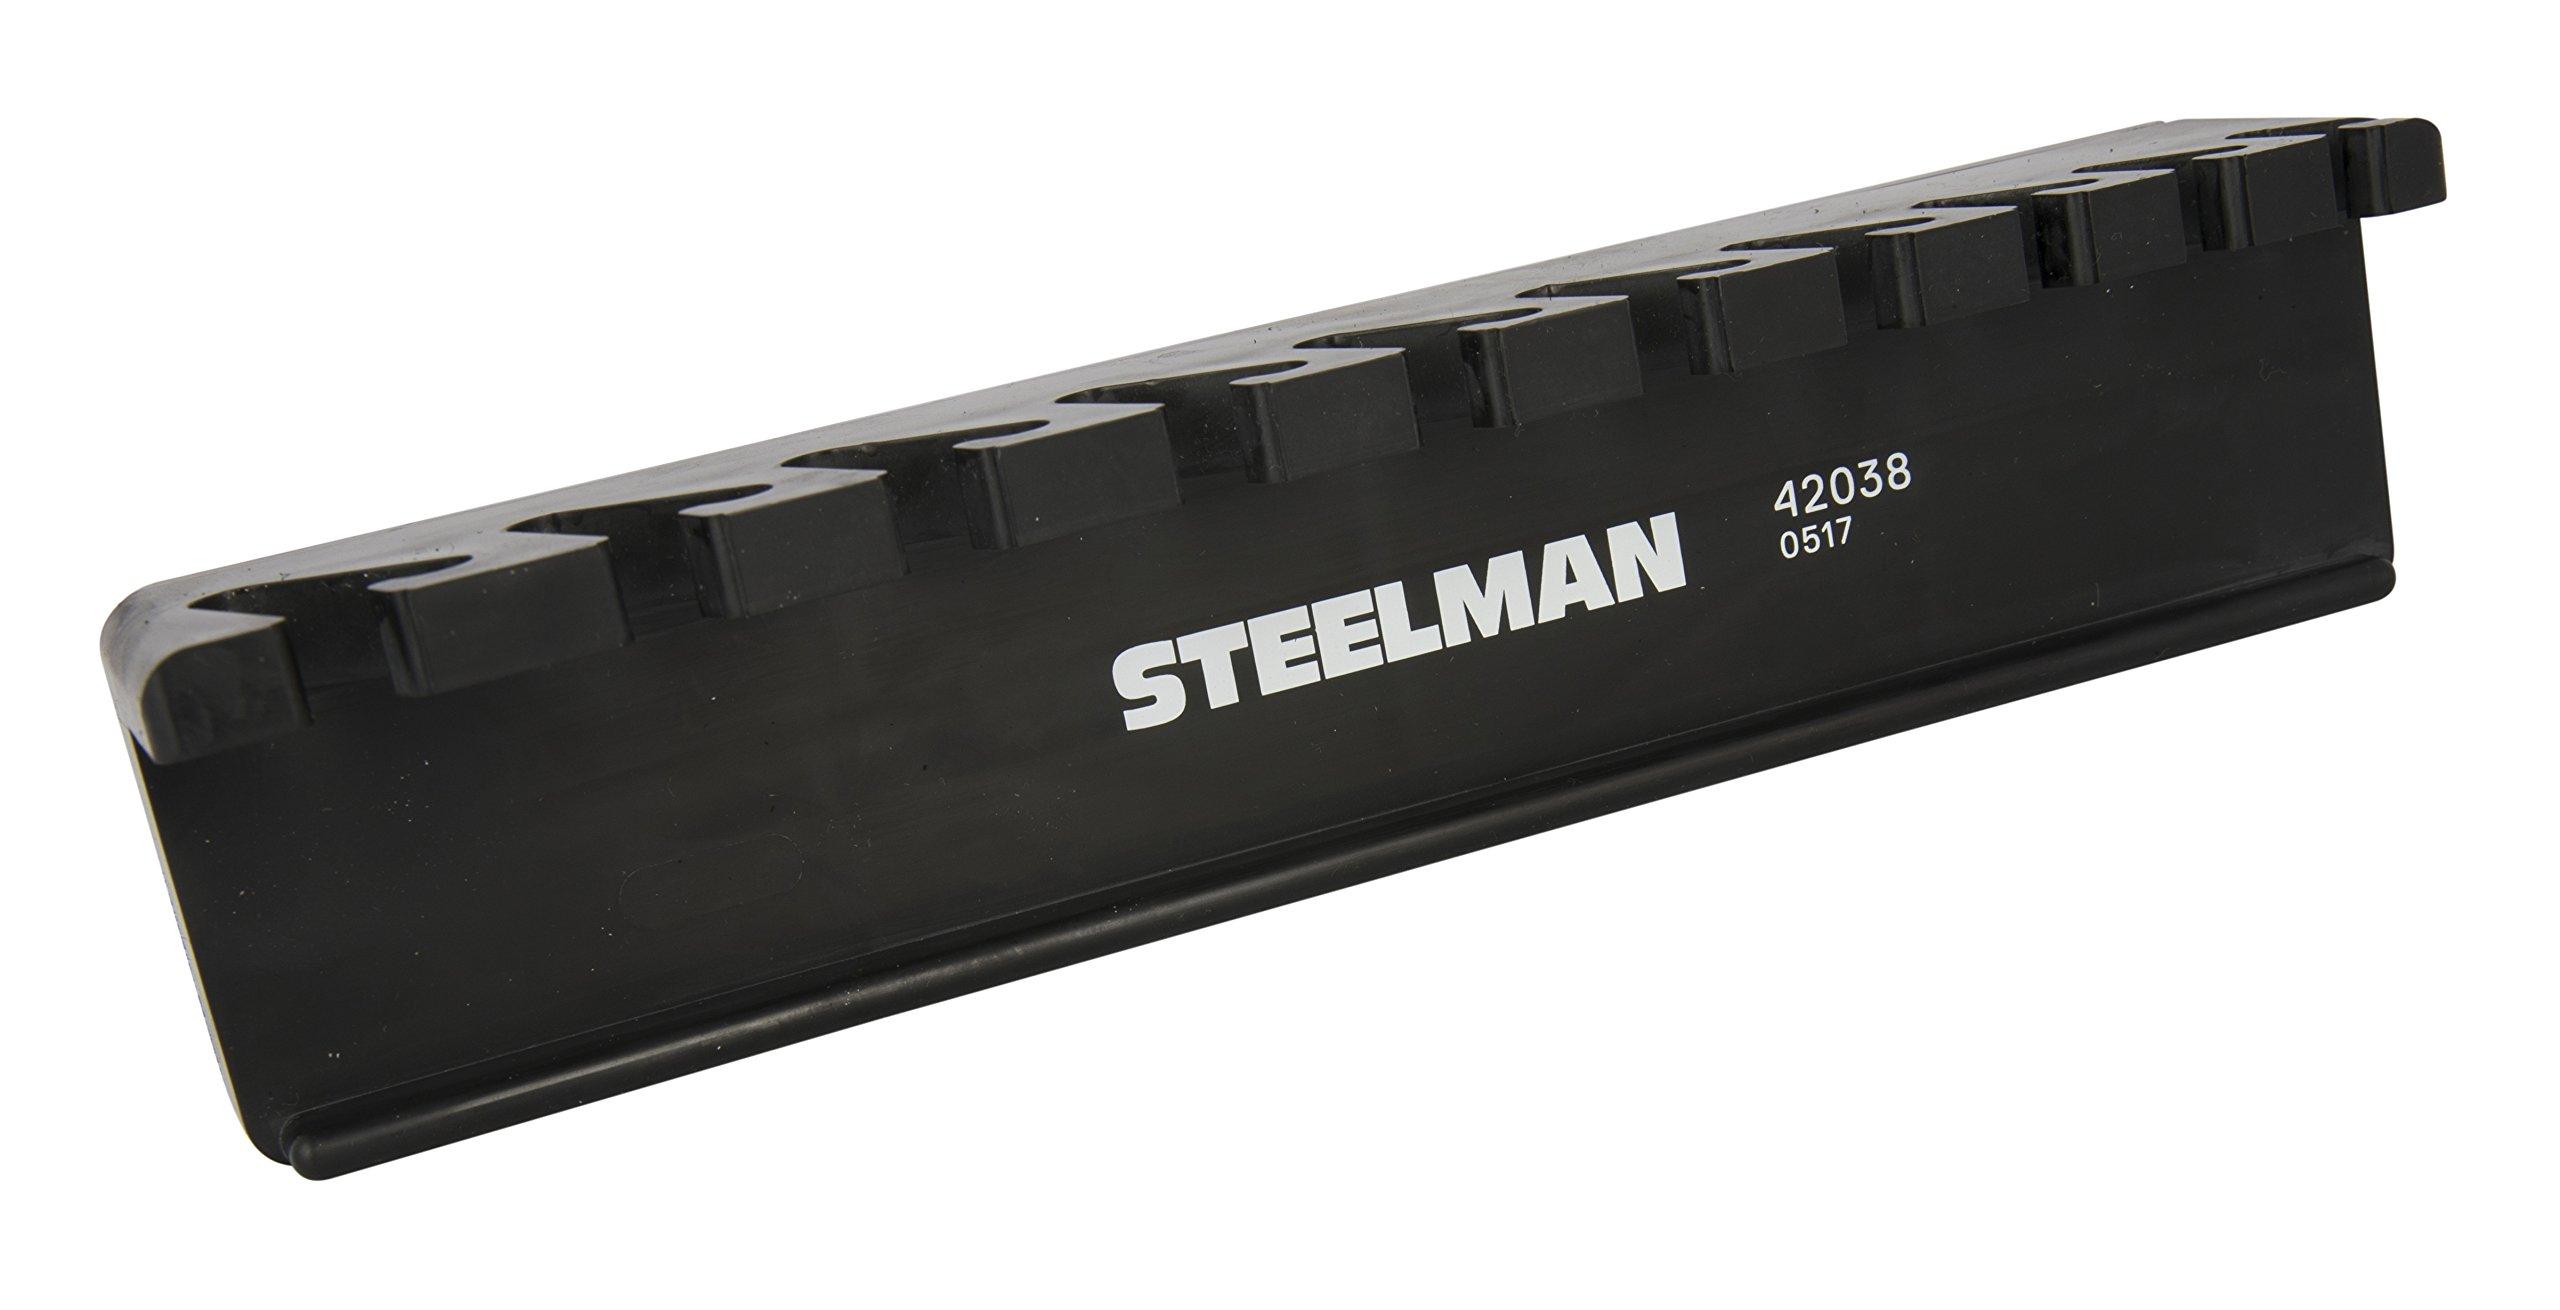 STEELMAN 42038 Magnetic Hanging Wrench Organizer